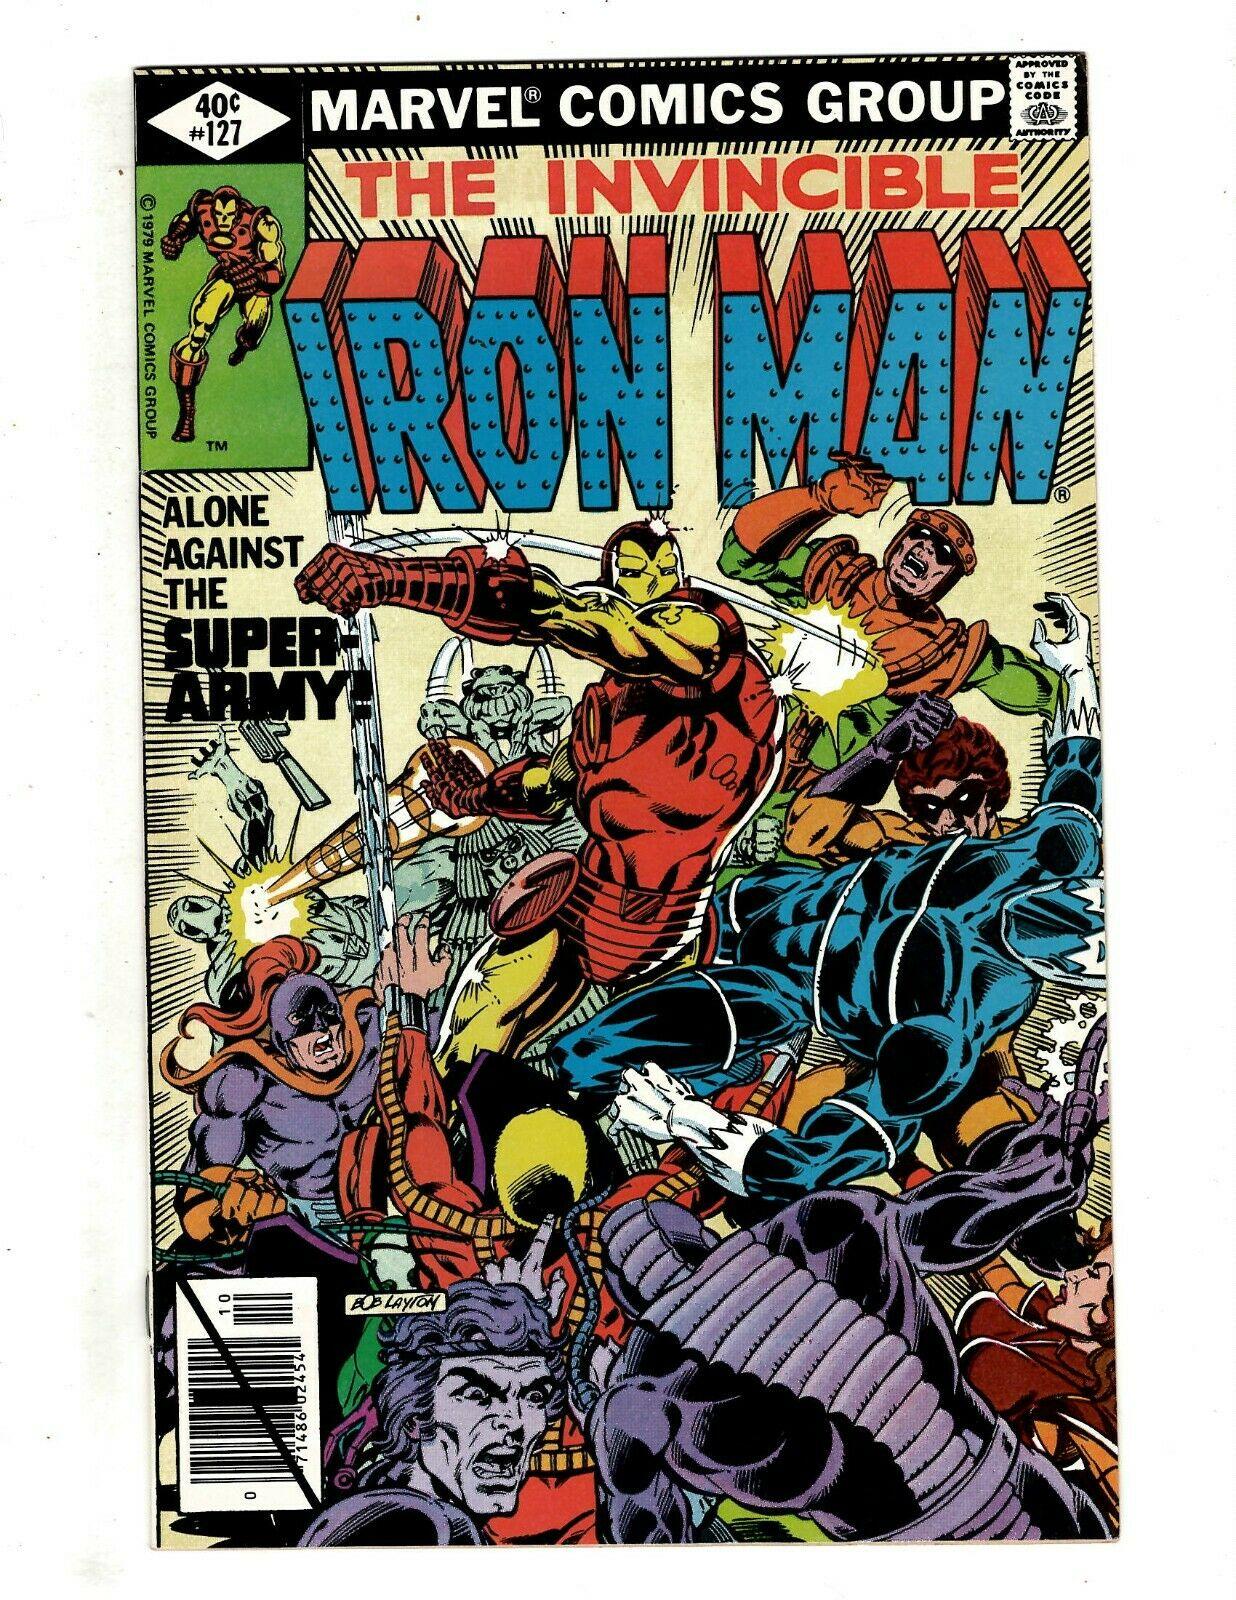 10 Iron Man Marvel Comics # 127 134 135 136 137 138 139 140 141 142 Stark J451